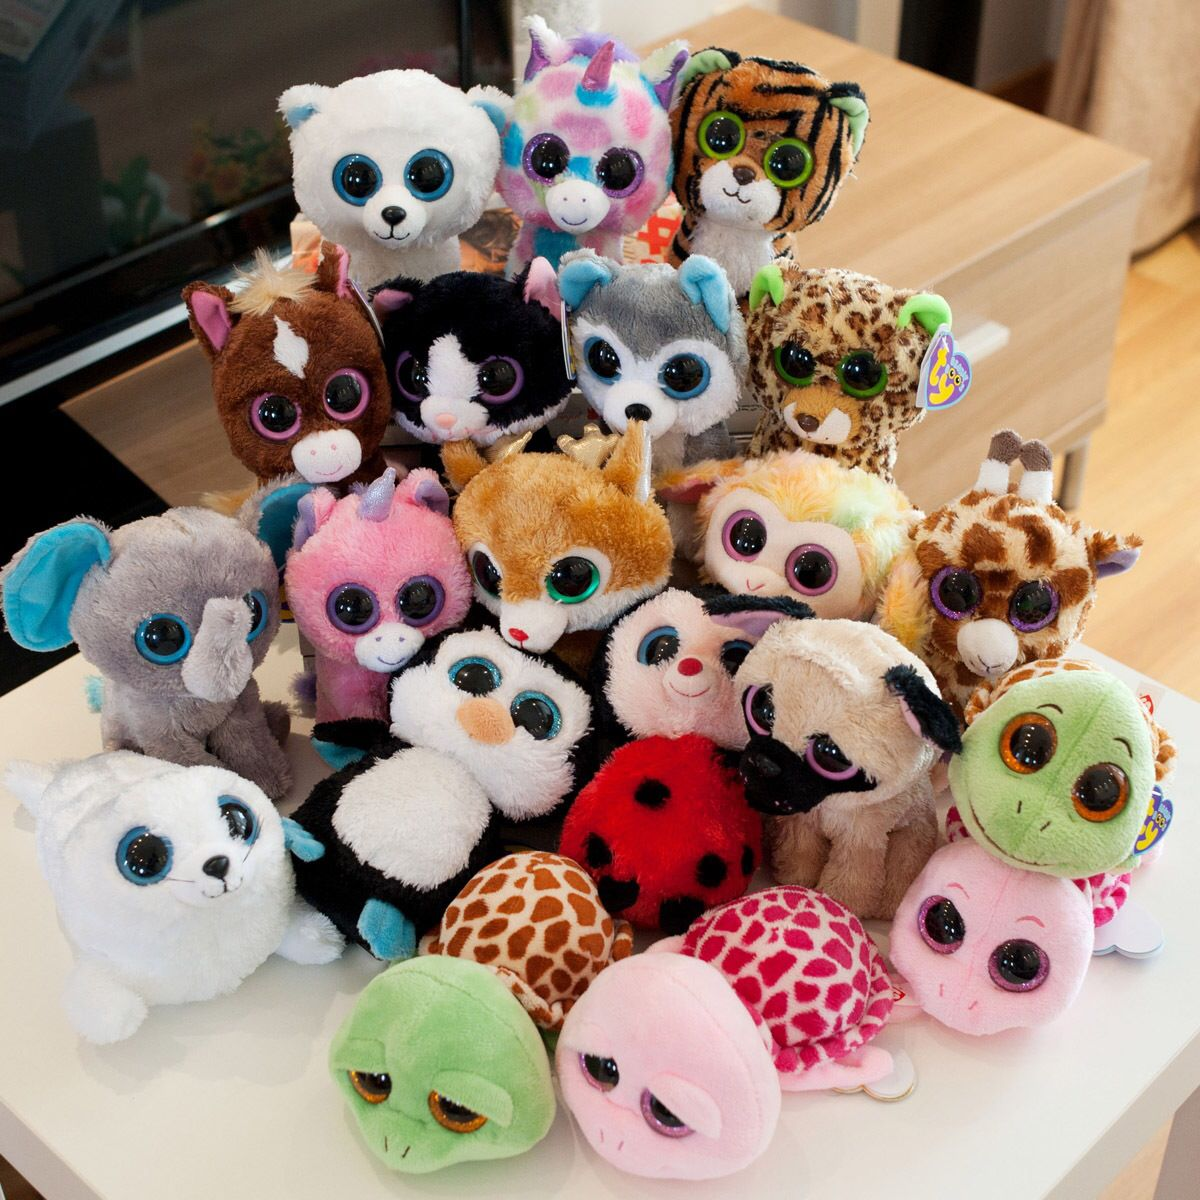 TY STUFFED ANIMALS Ty stuffed animals, Cute stuffed